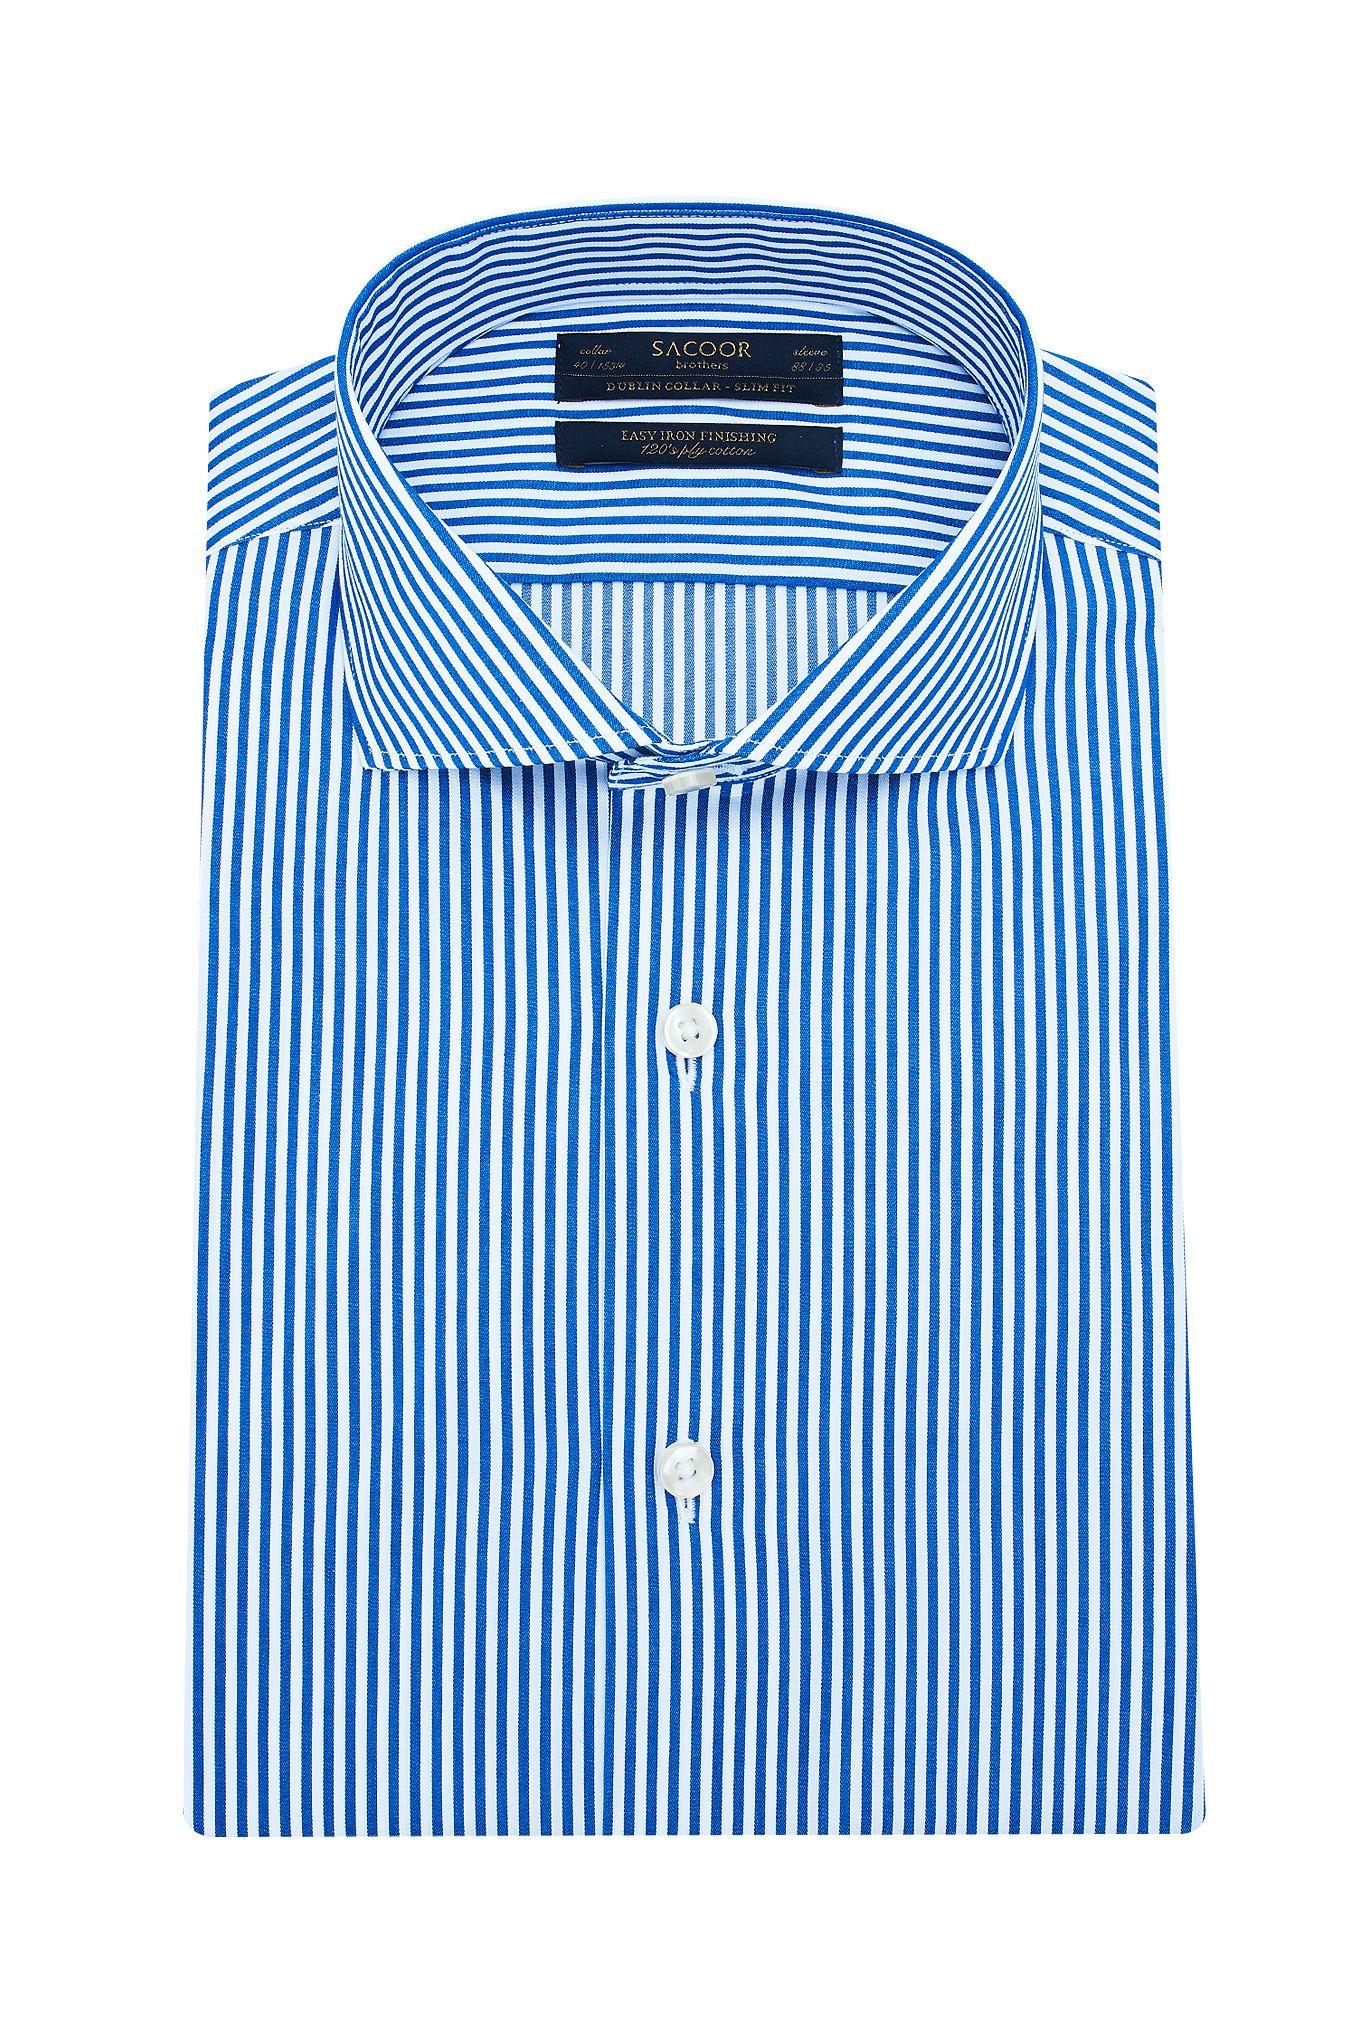 Men's Classic Slim Fit Shirt